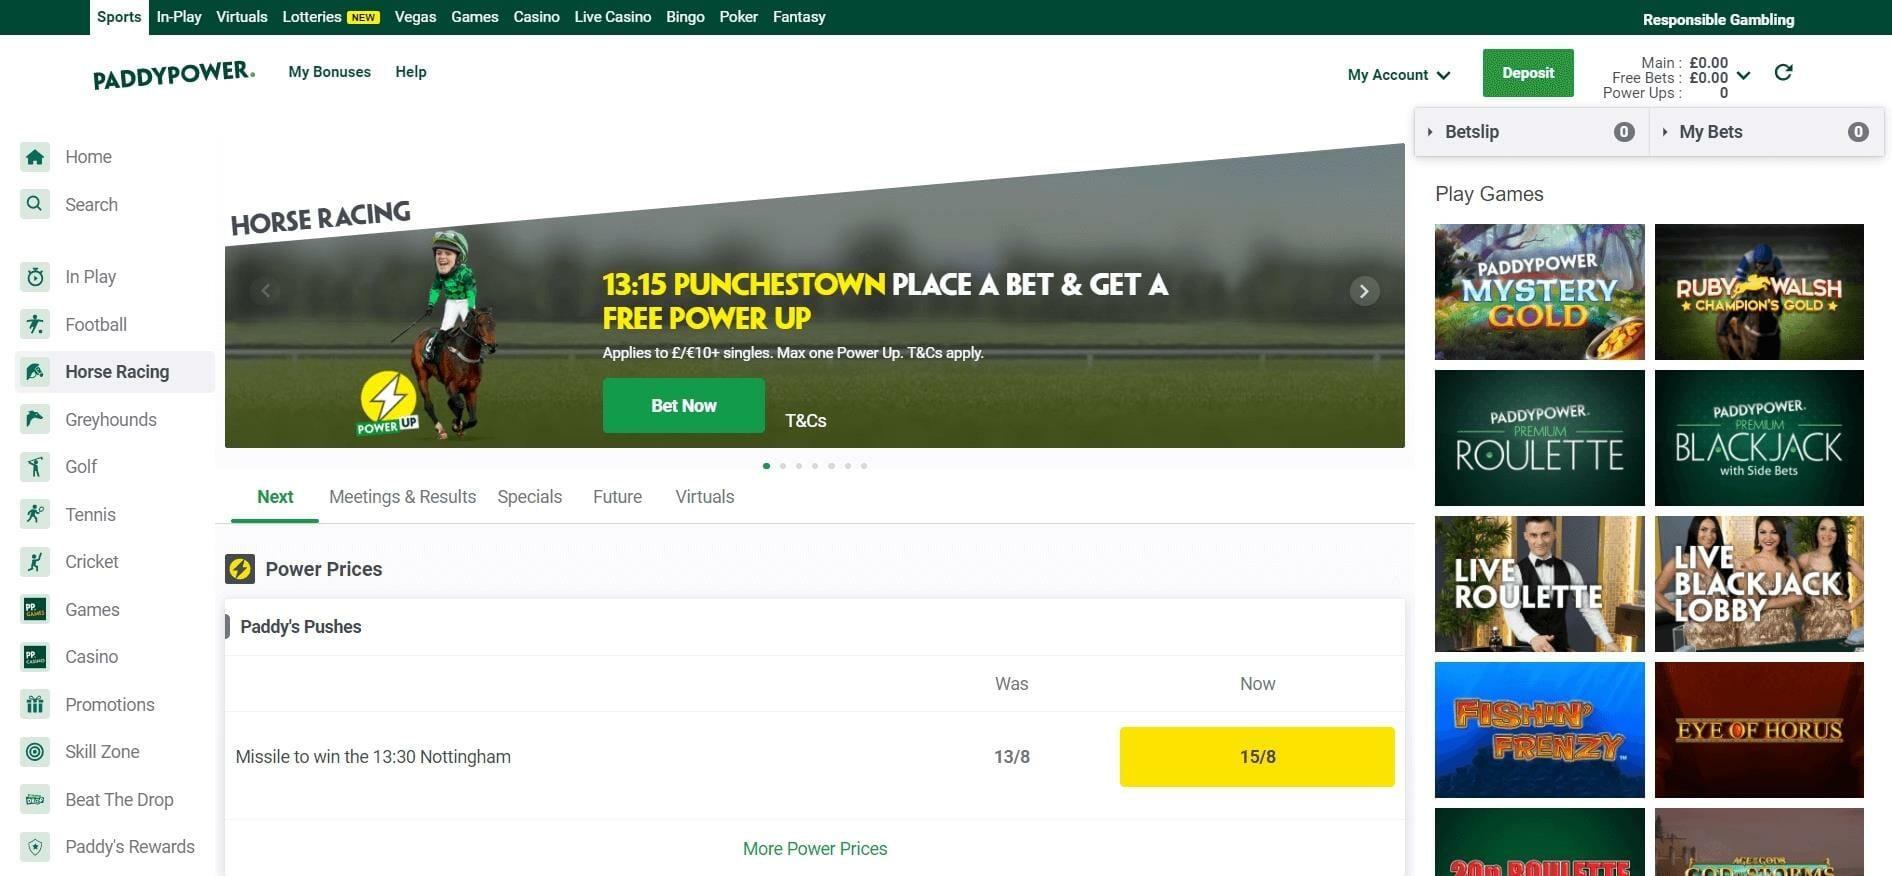 Paddy Power Horse Racing betting